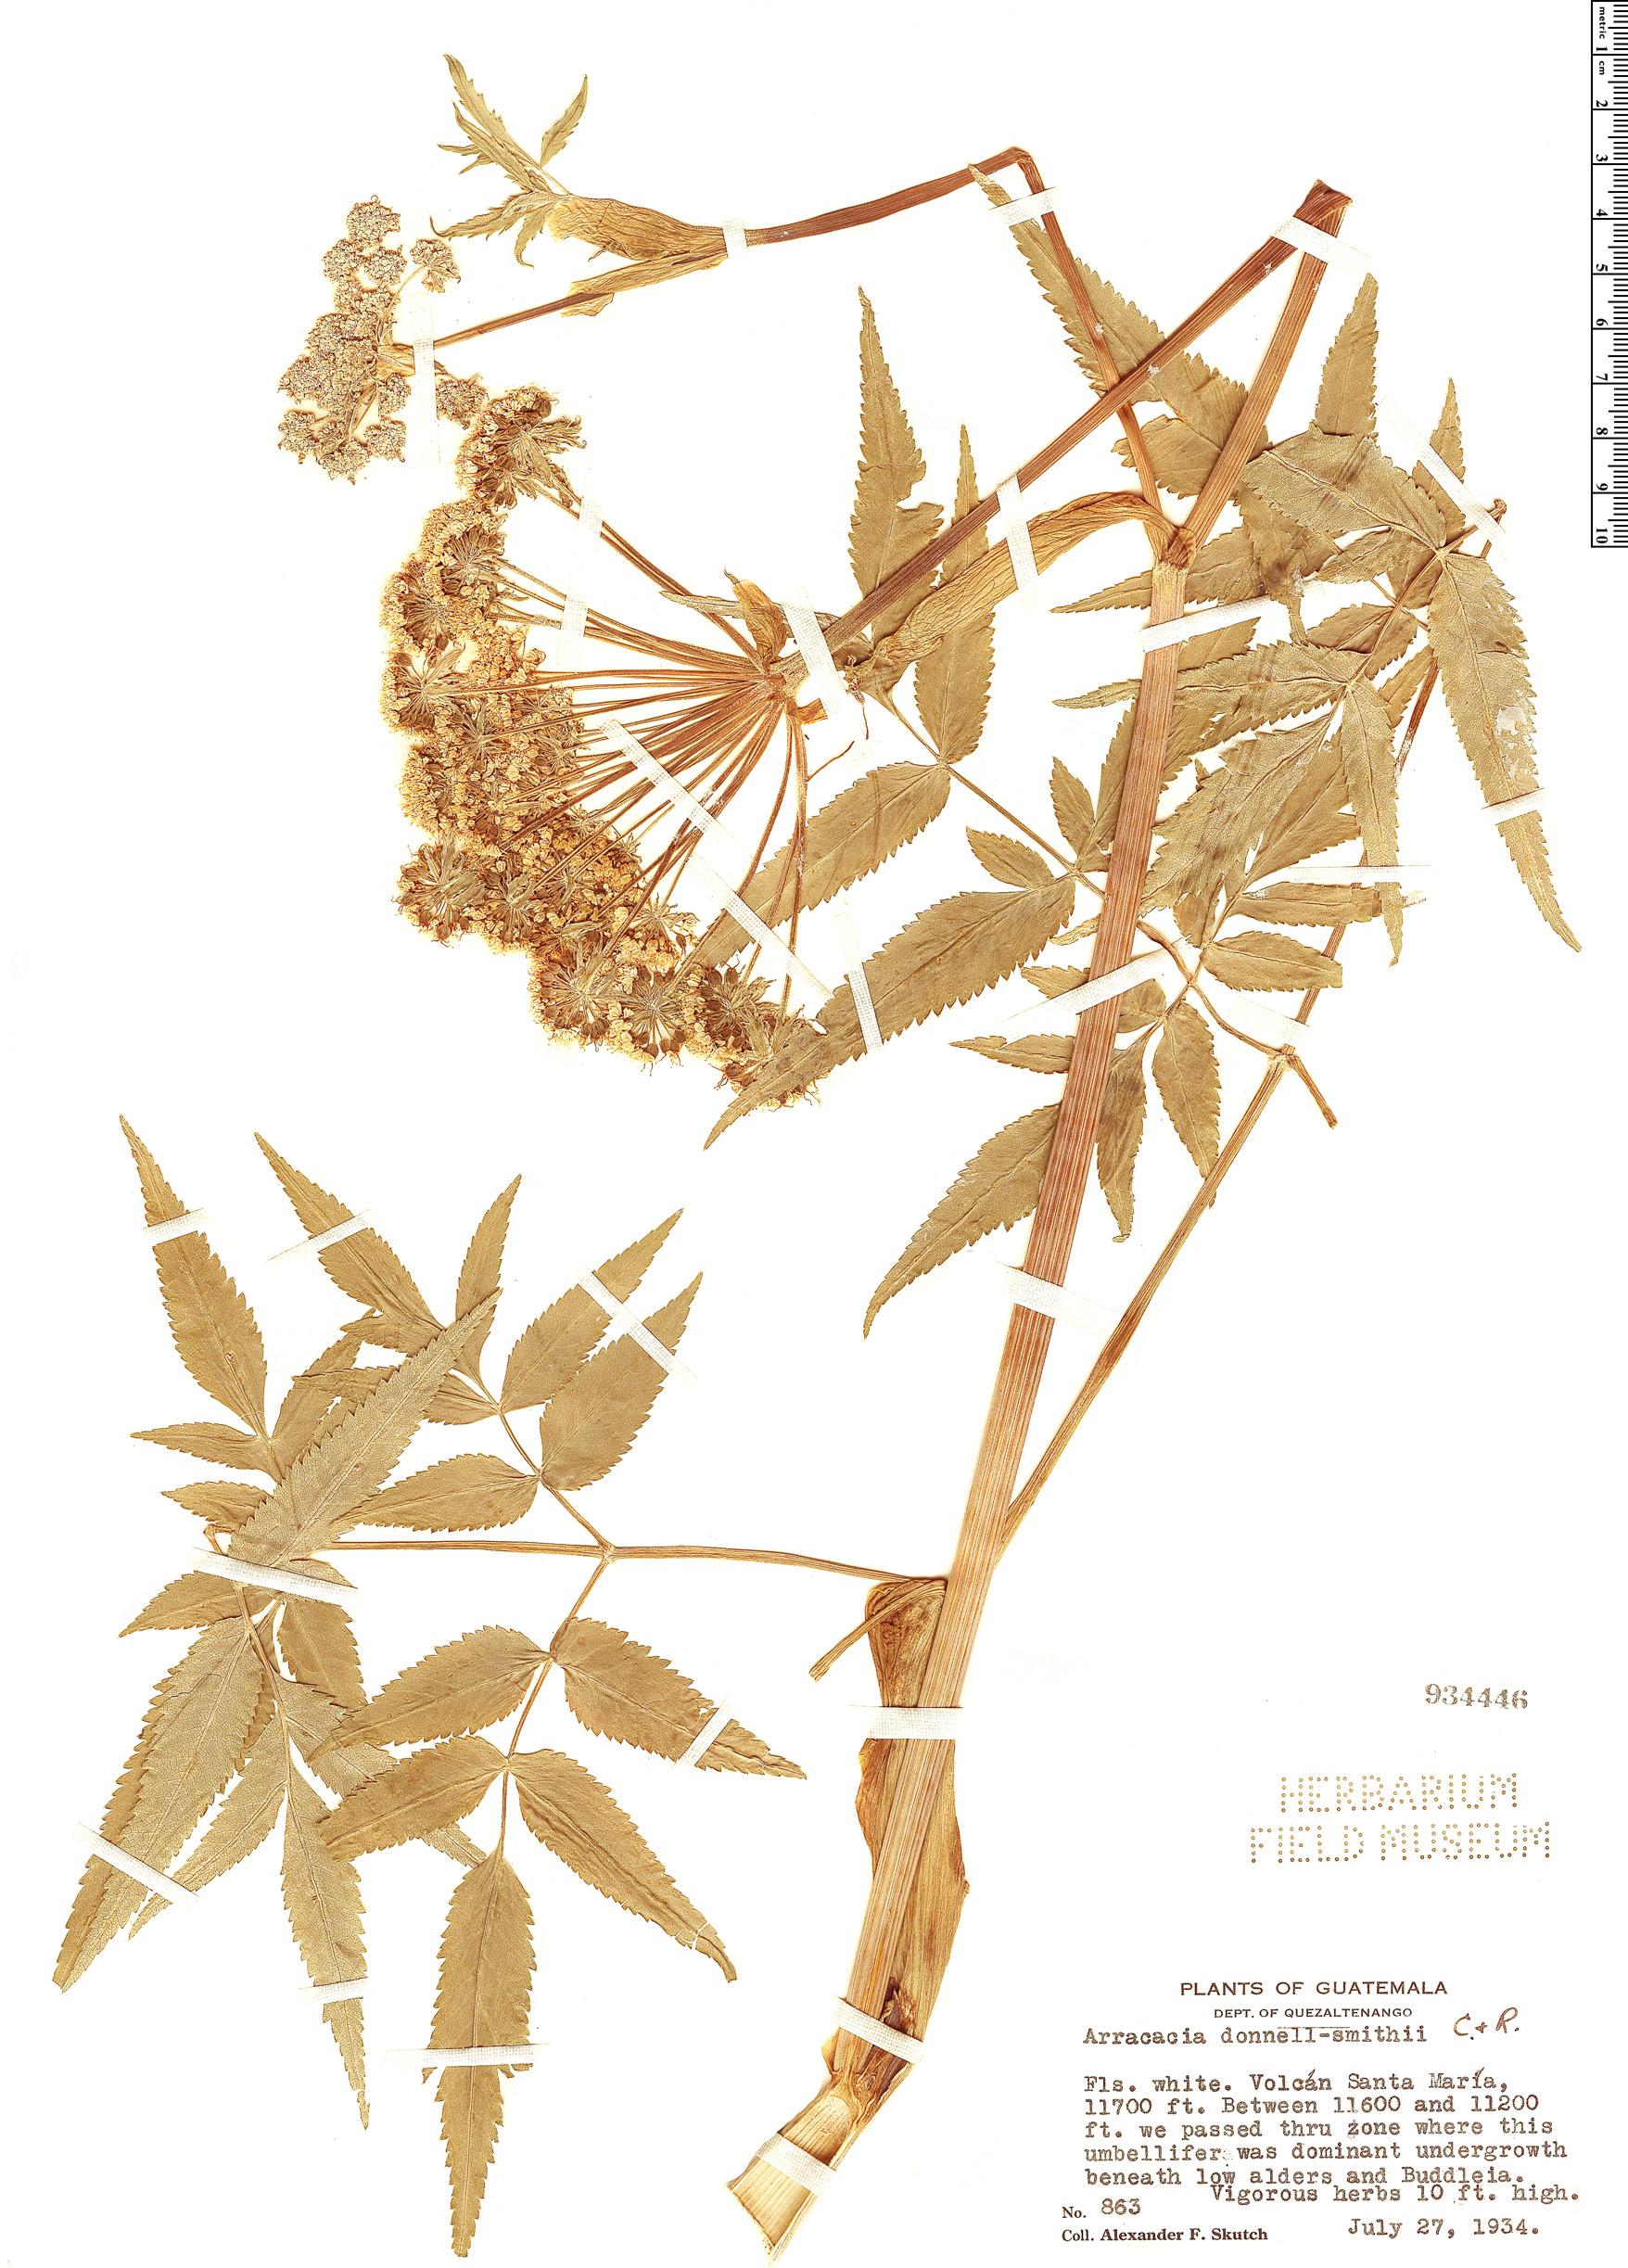 Specimen: Arracacia donnell-smithii